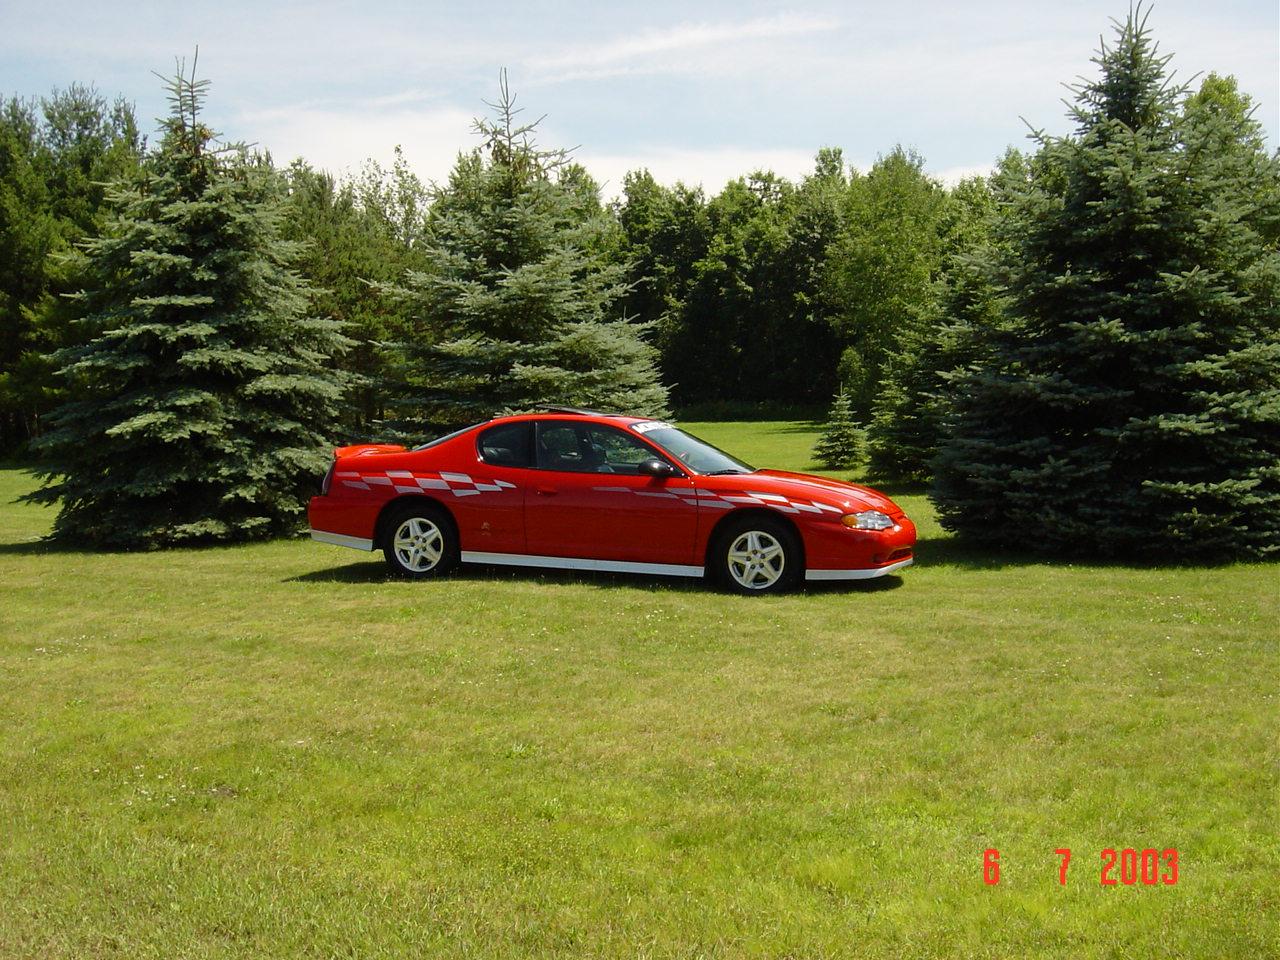 2004 Chevrolet Monte Carlo Pace Car Ed W 45000 Orig Miles